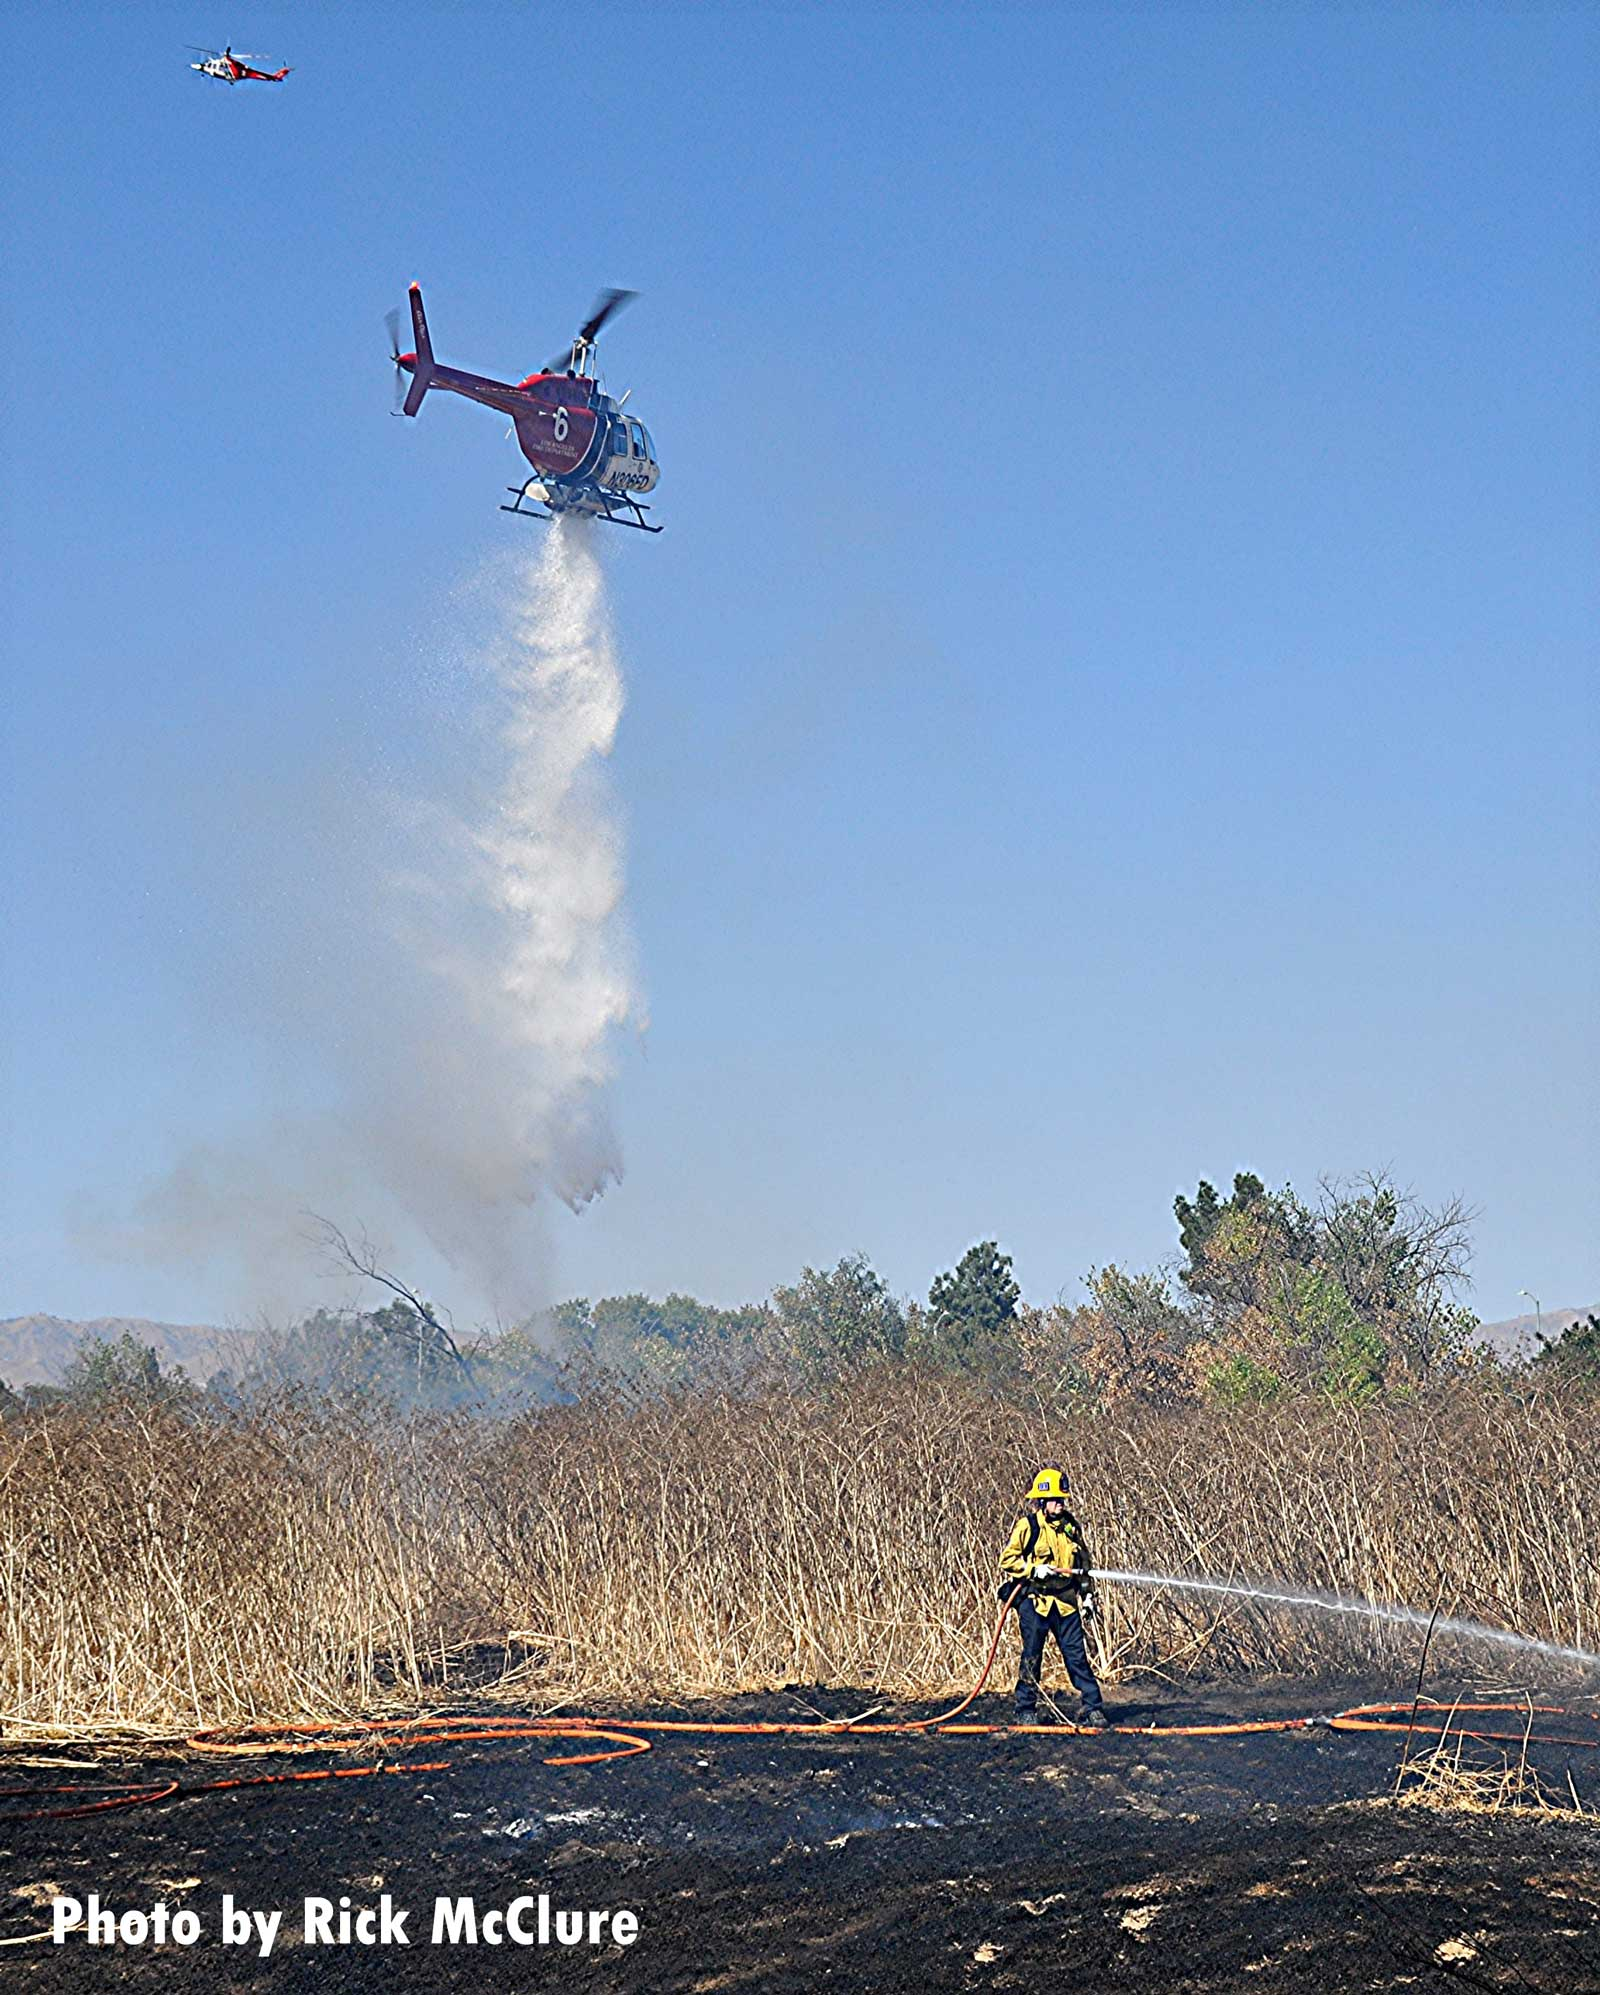 Copter makes drop on L.A. vegetation fire